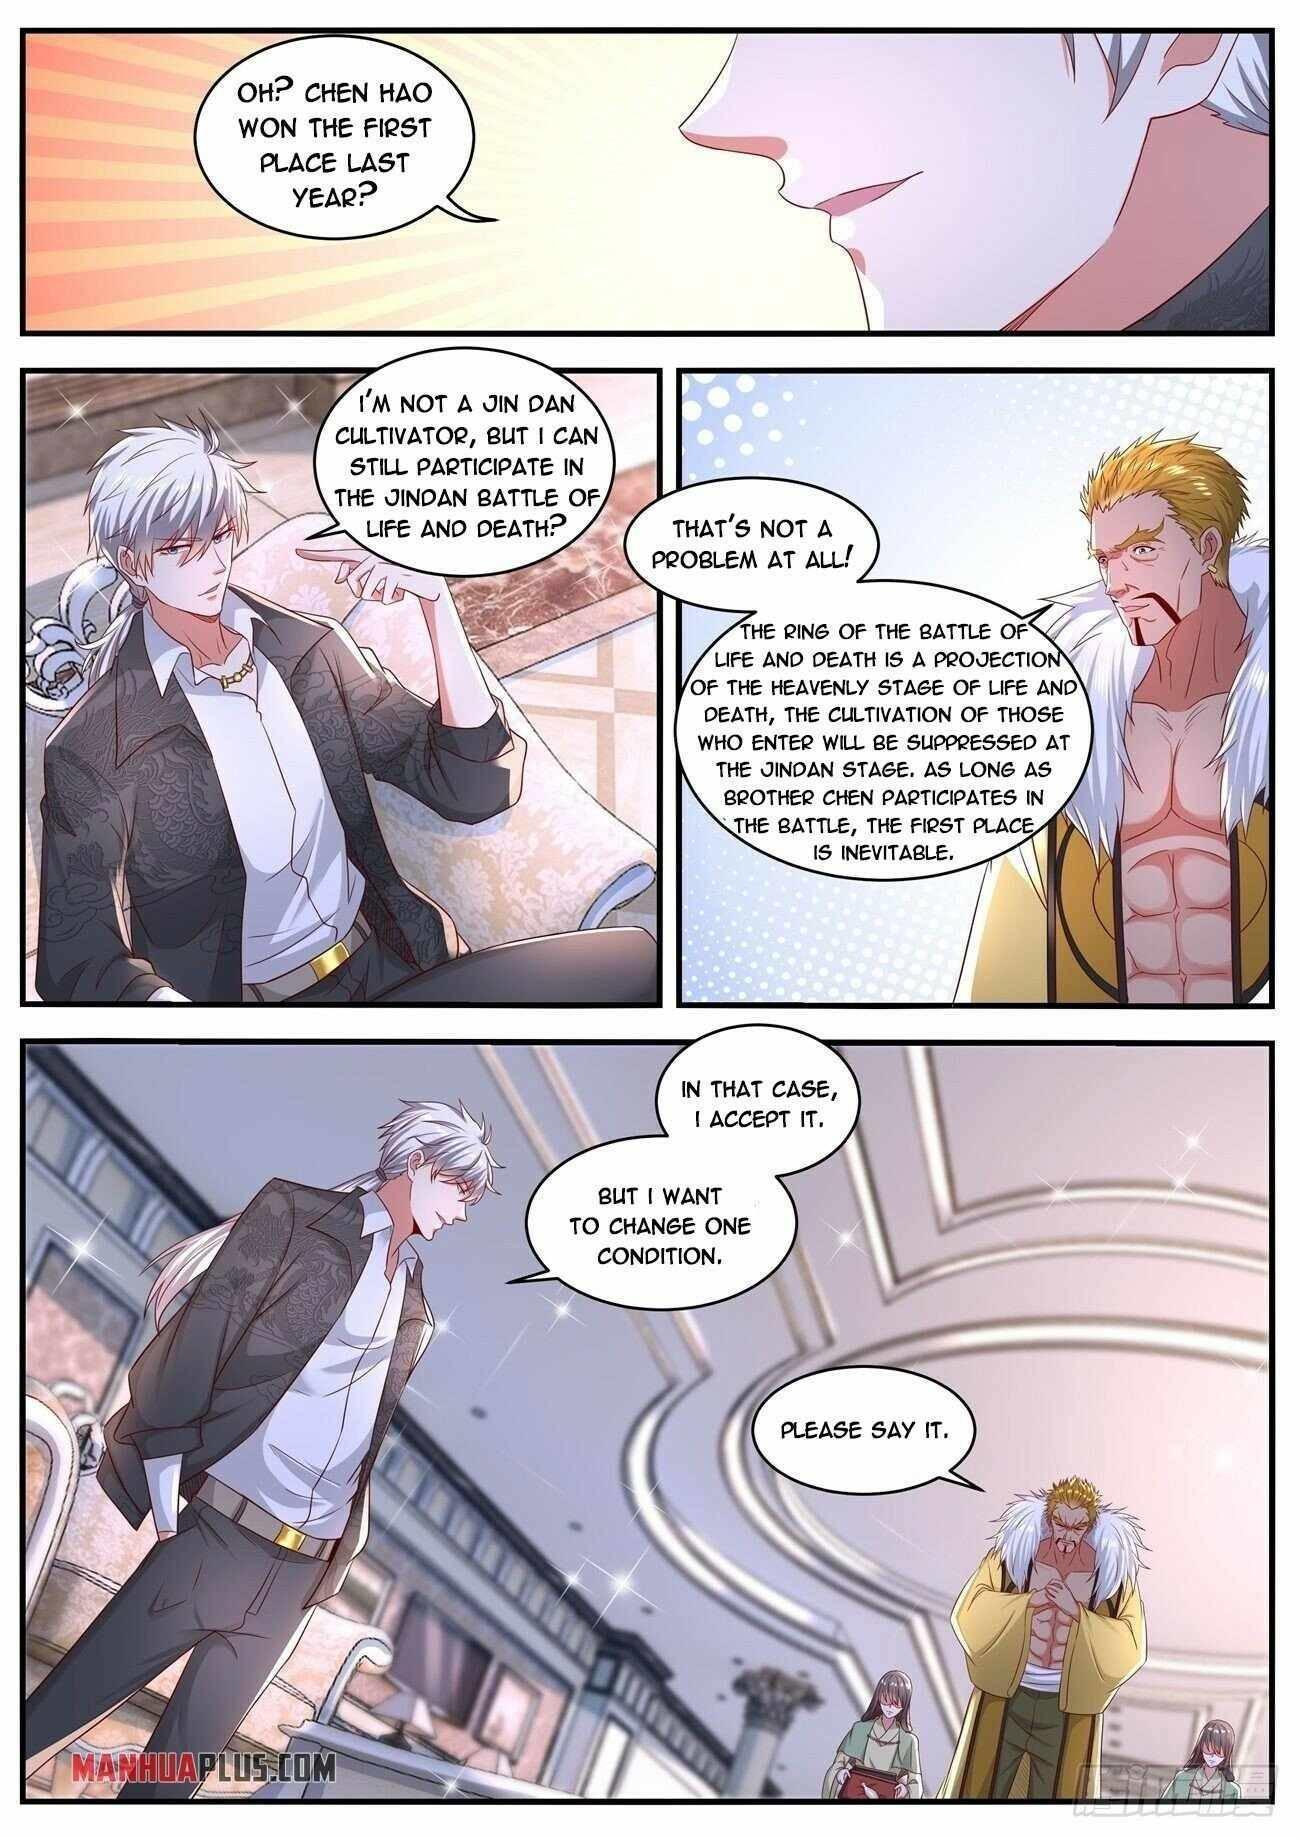 Rebirth Of The Urban Immortal Cultivator Chapter 639 page 11 - Mangakakalot